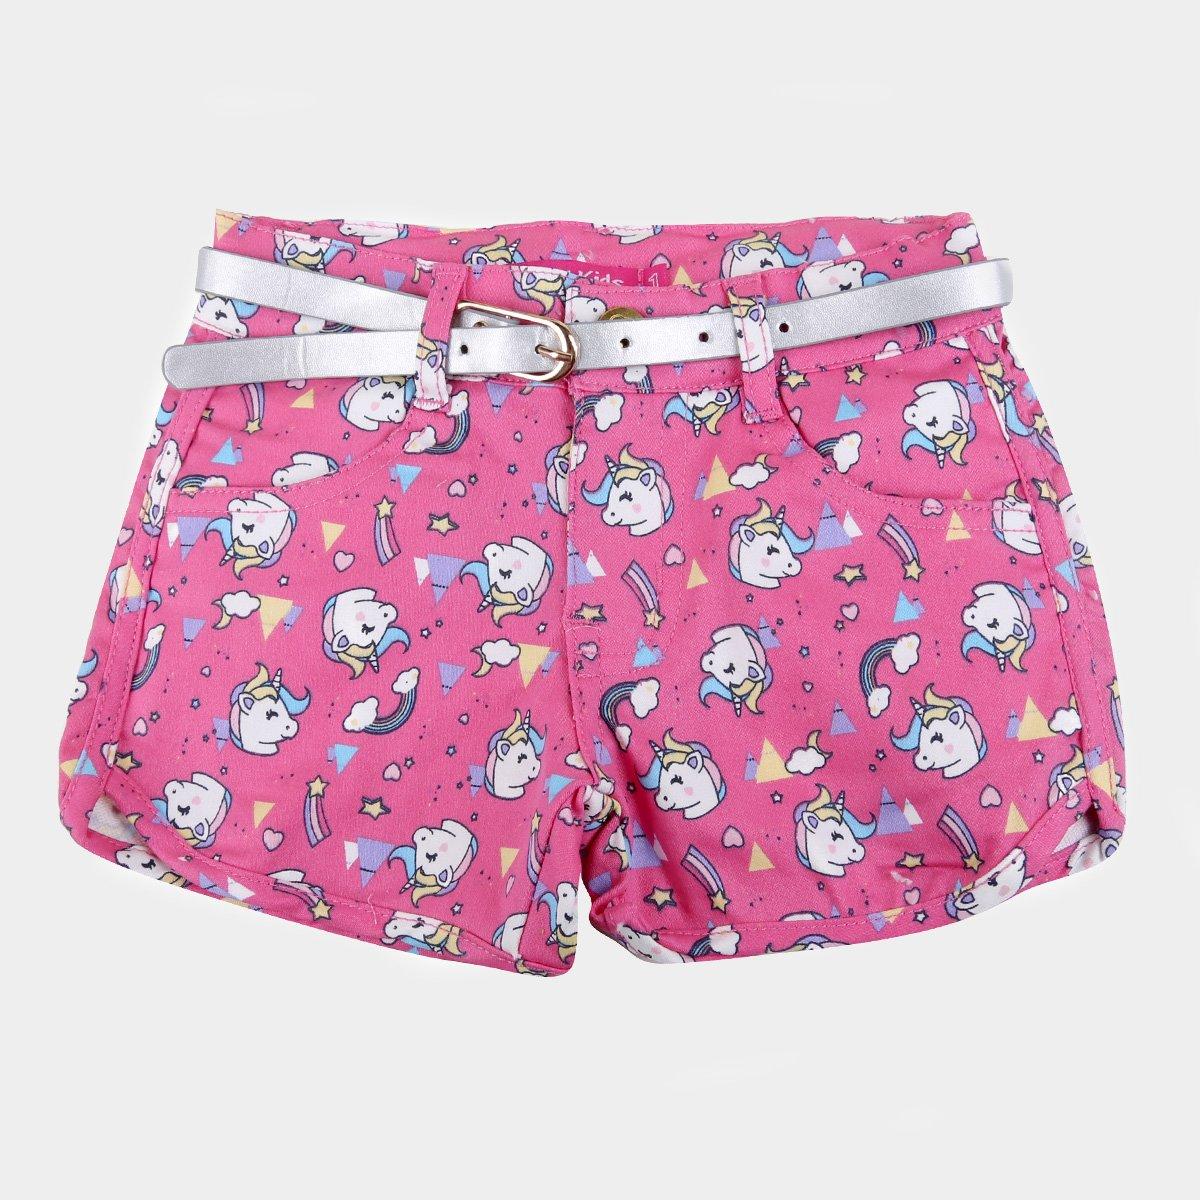 Shorts Bebê Plural Kids Cinto Unicórnio Feminino